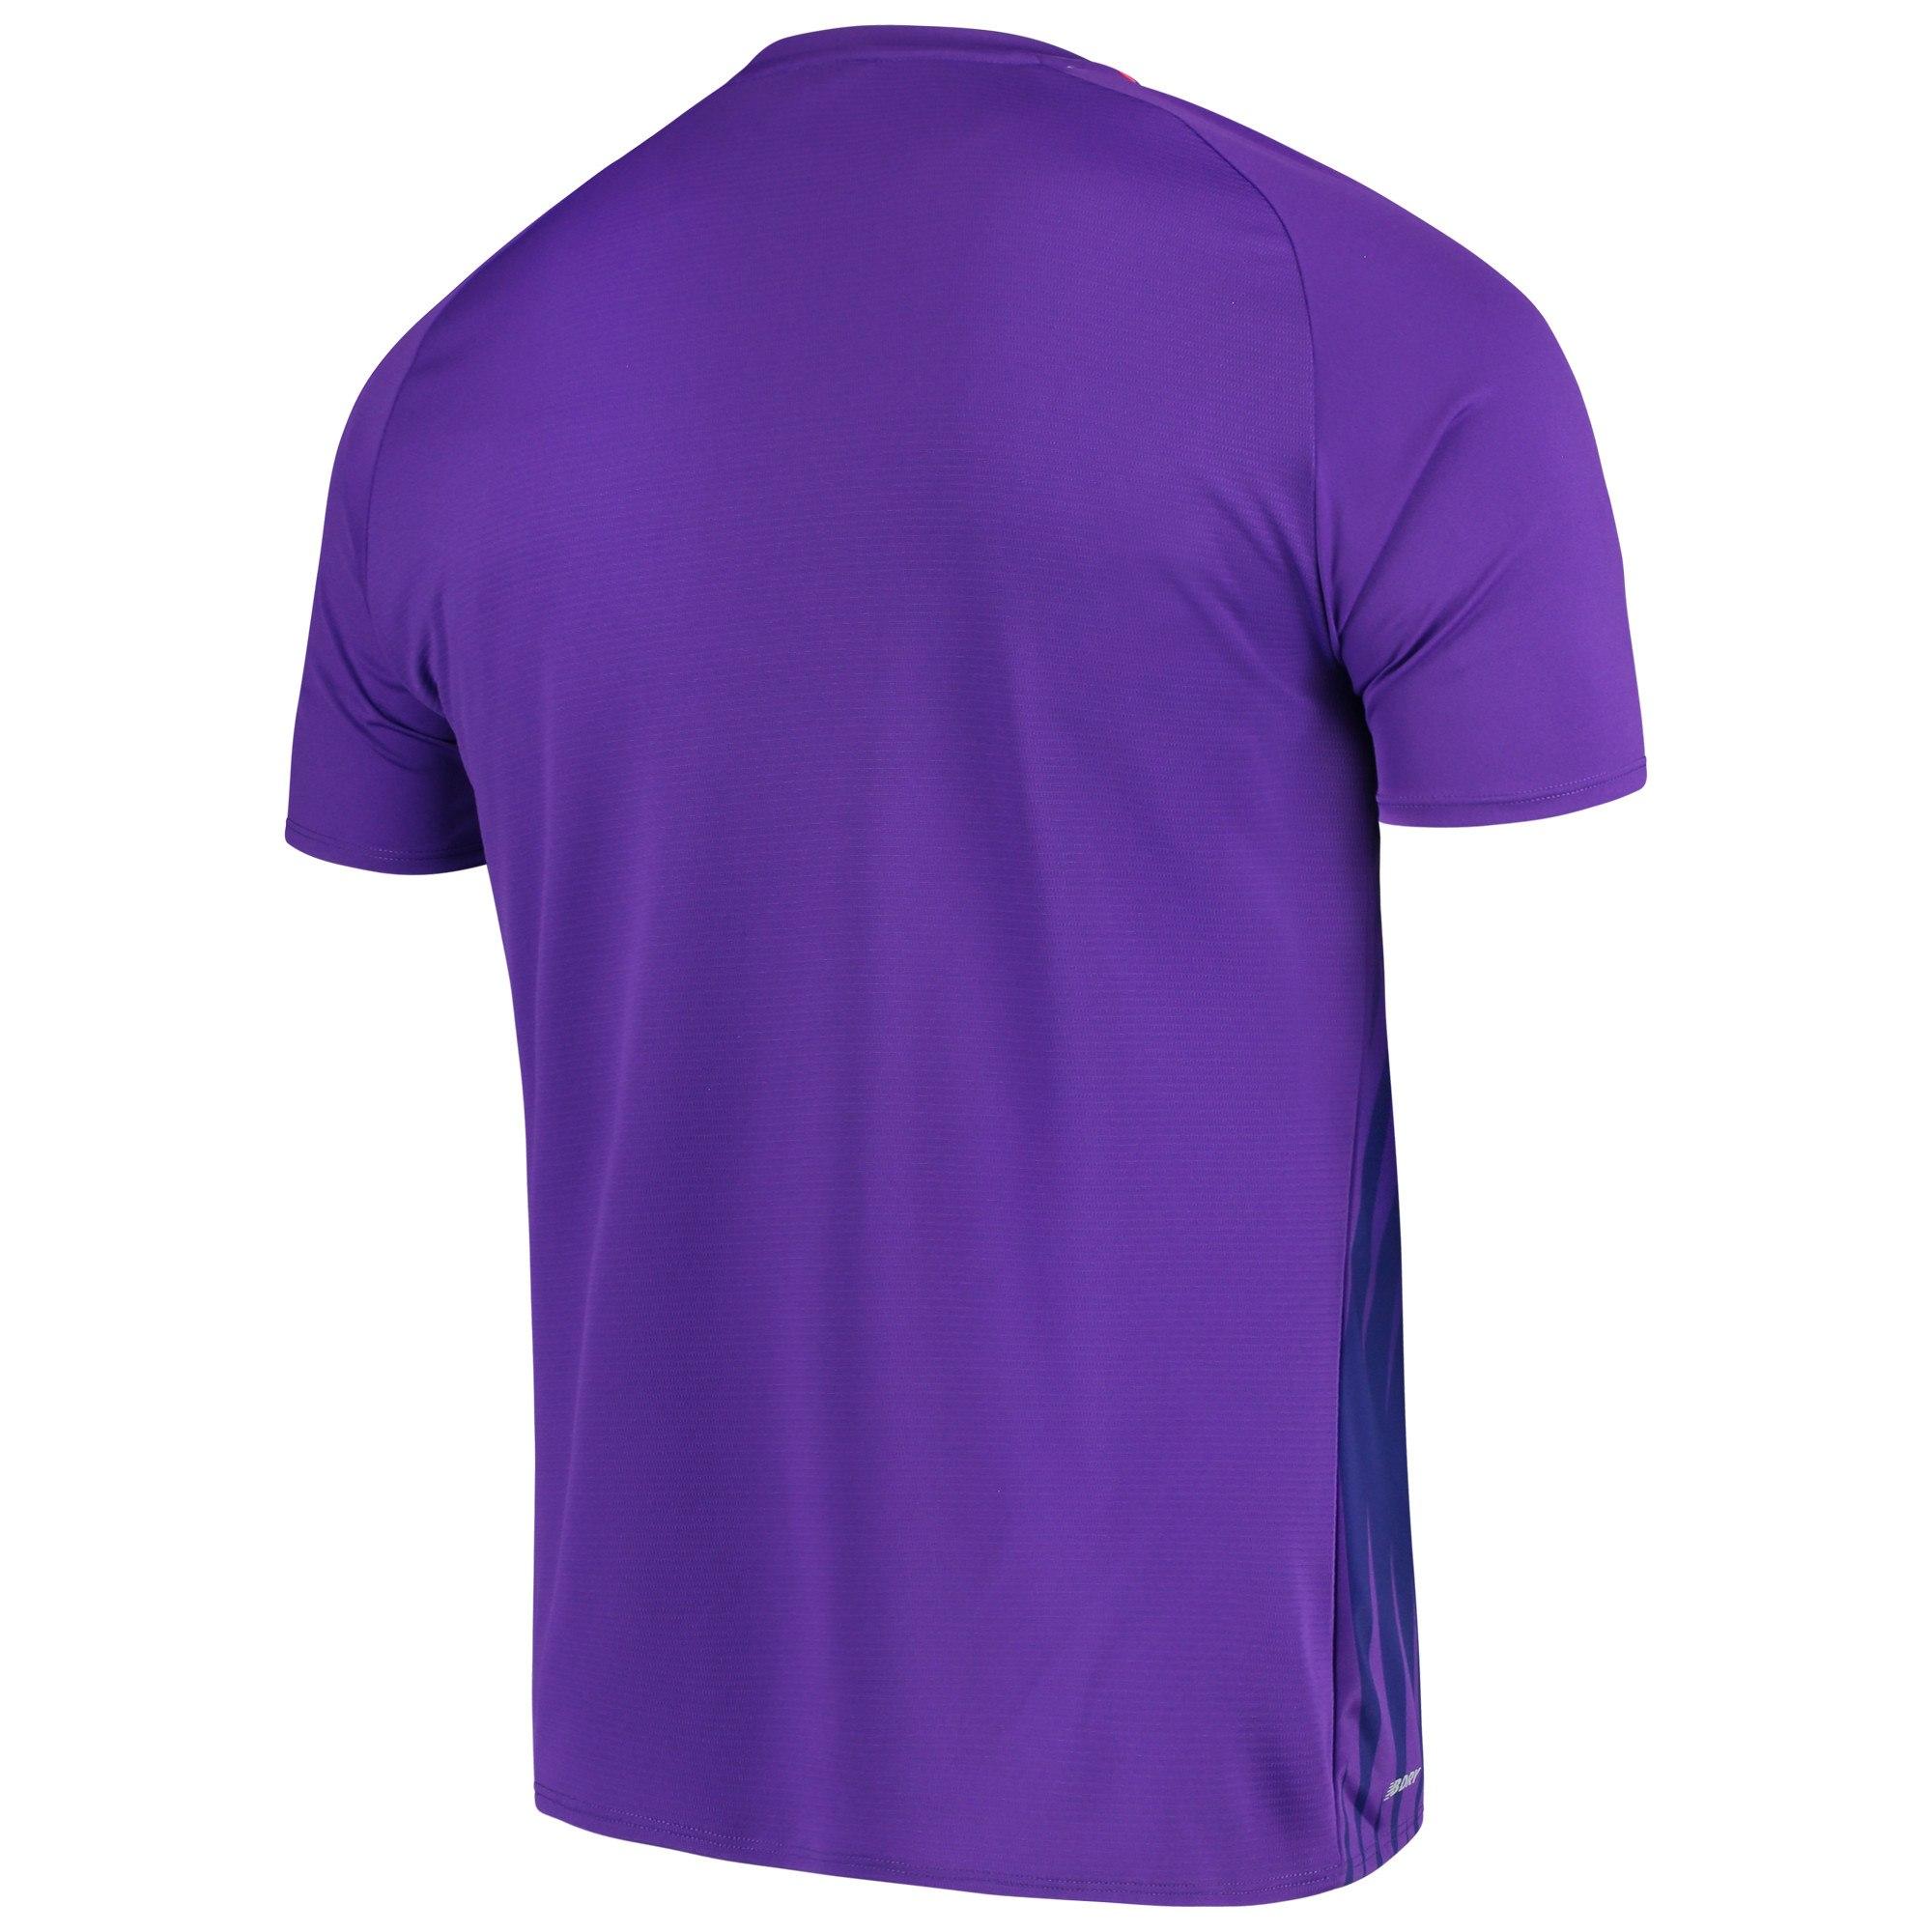 067821ac67d US  15.8 - New Balance Liverpool Purple 2018 19 Elite Training Match Day  Jersey - www.fcsoccerworld.com